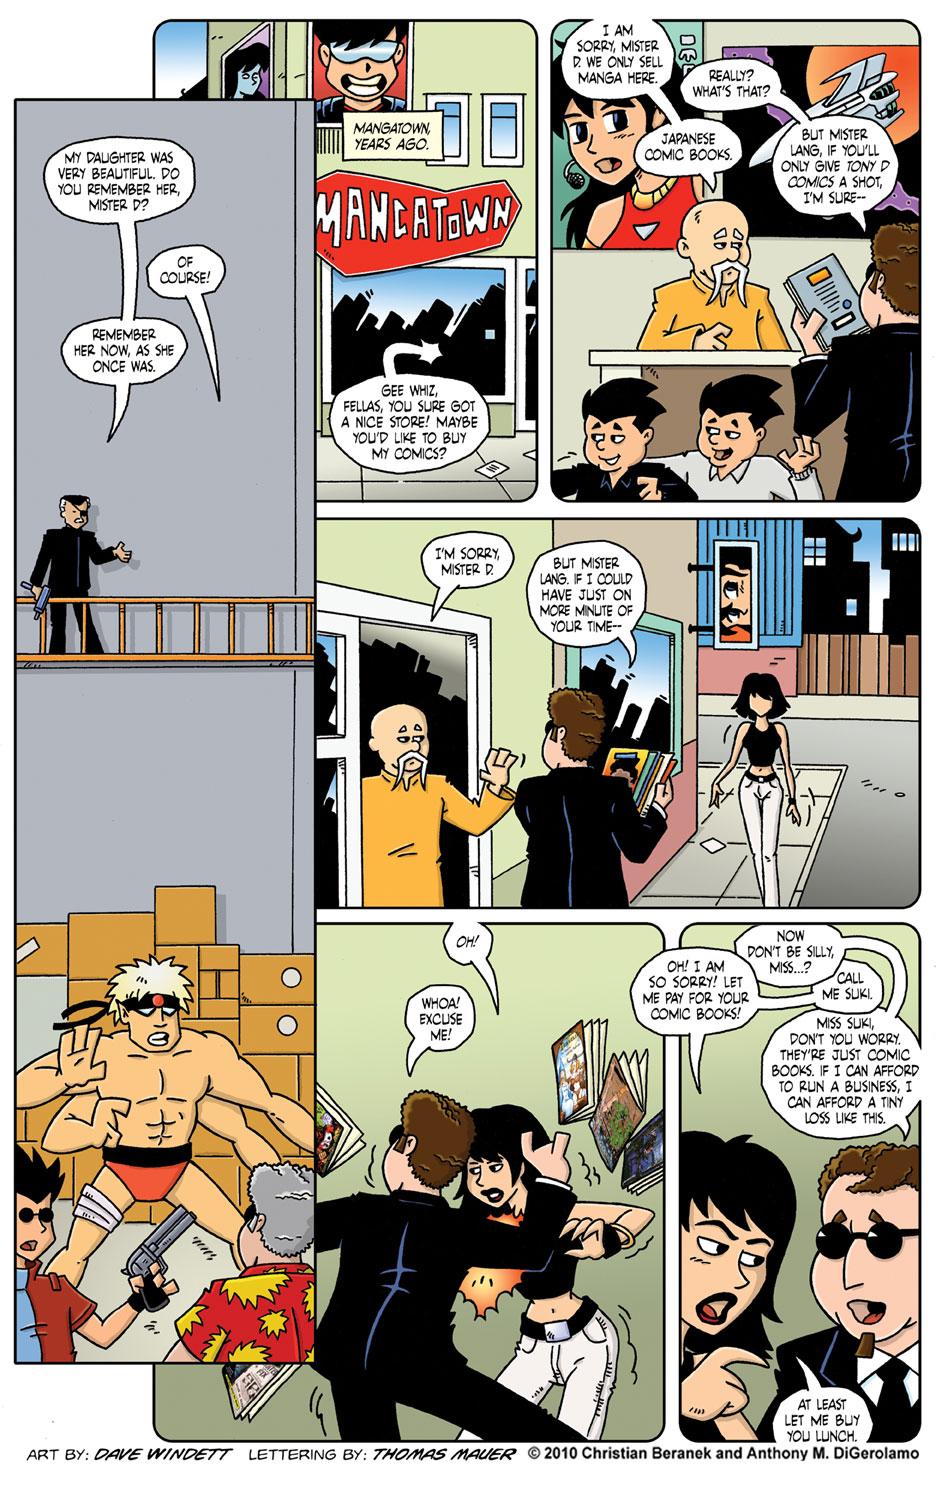 Comic Book Mafia #21: The Secret Origin of Tony D